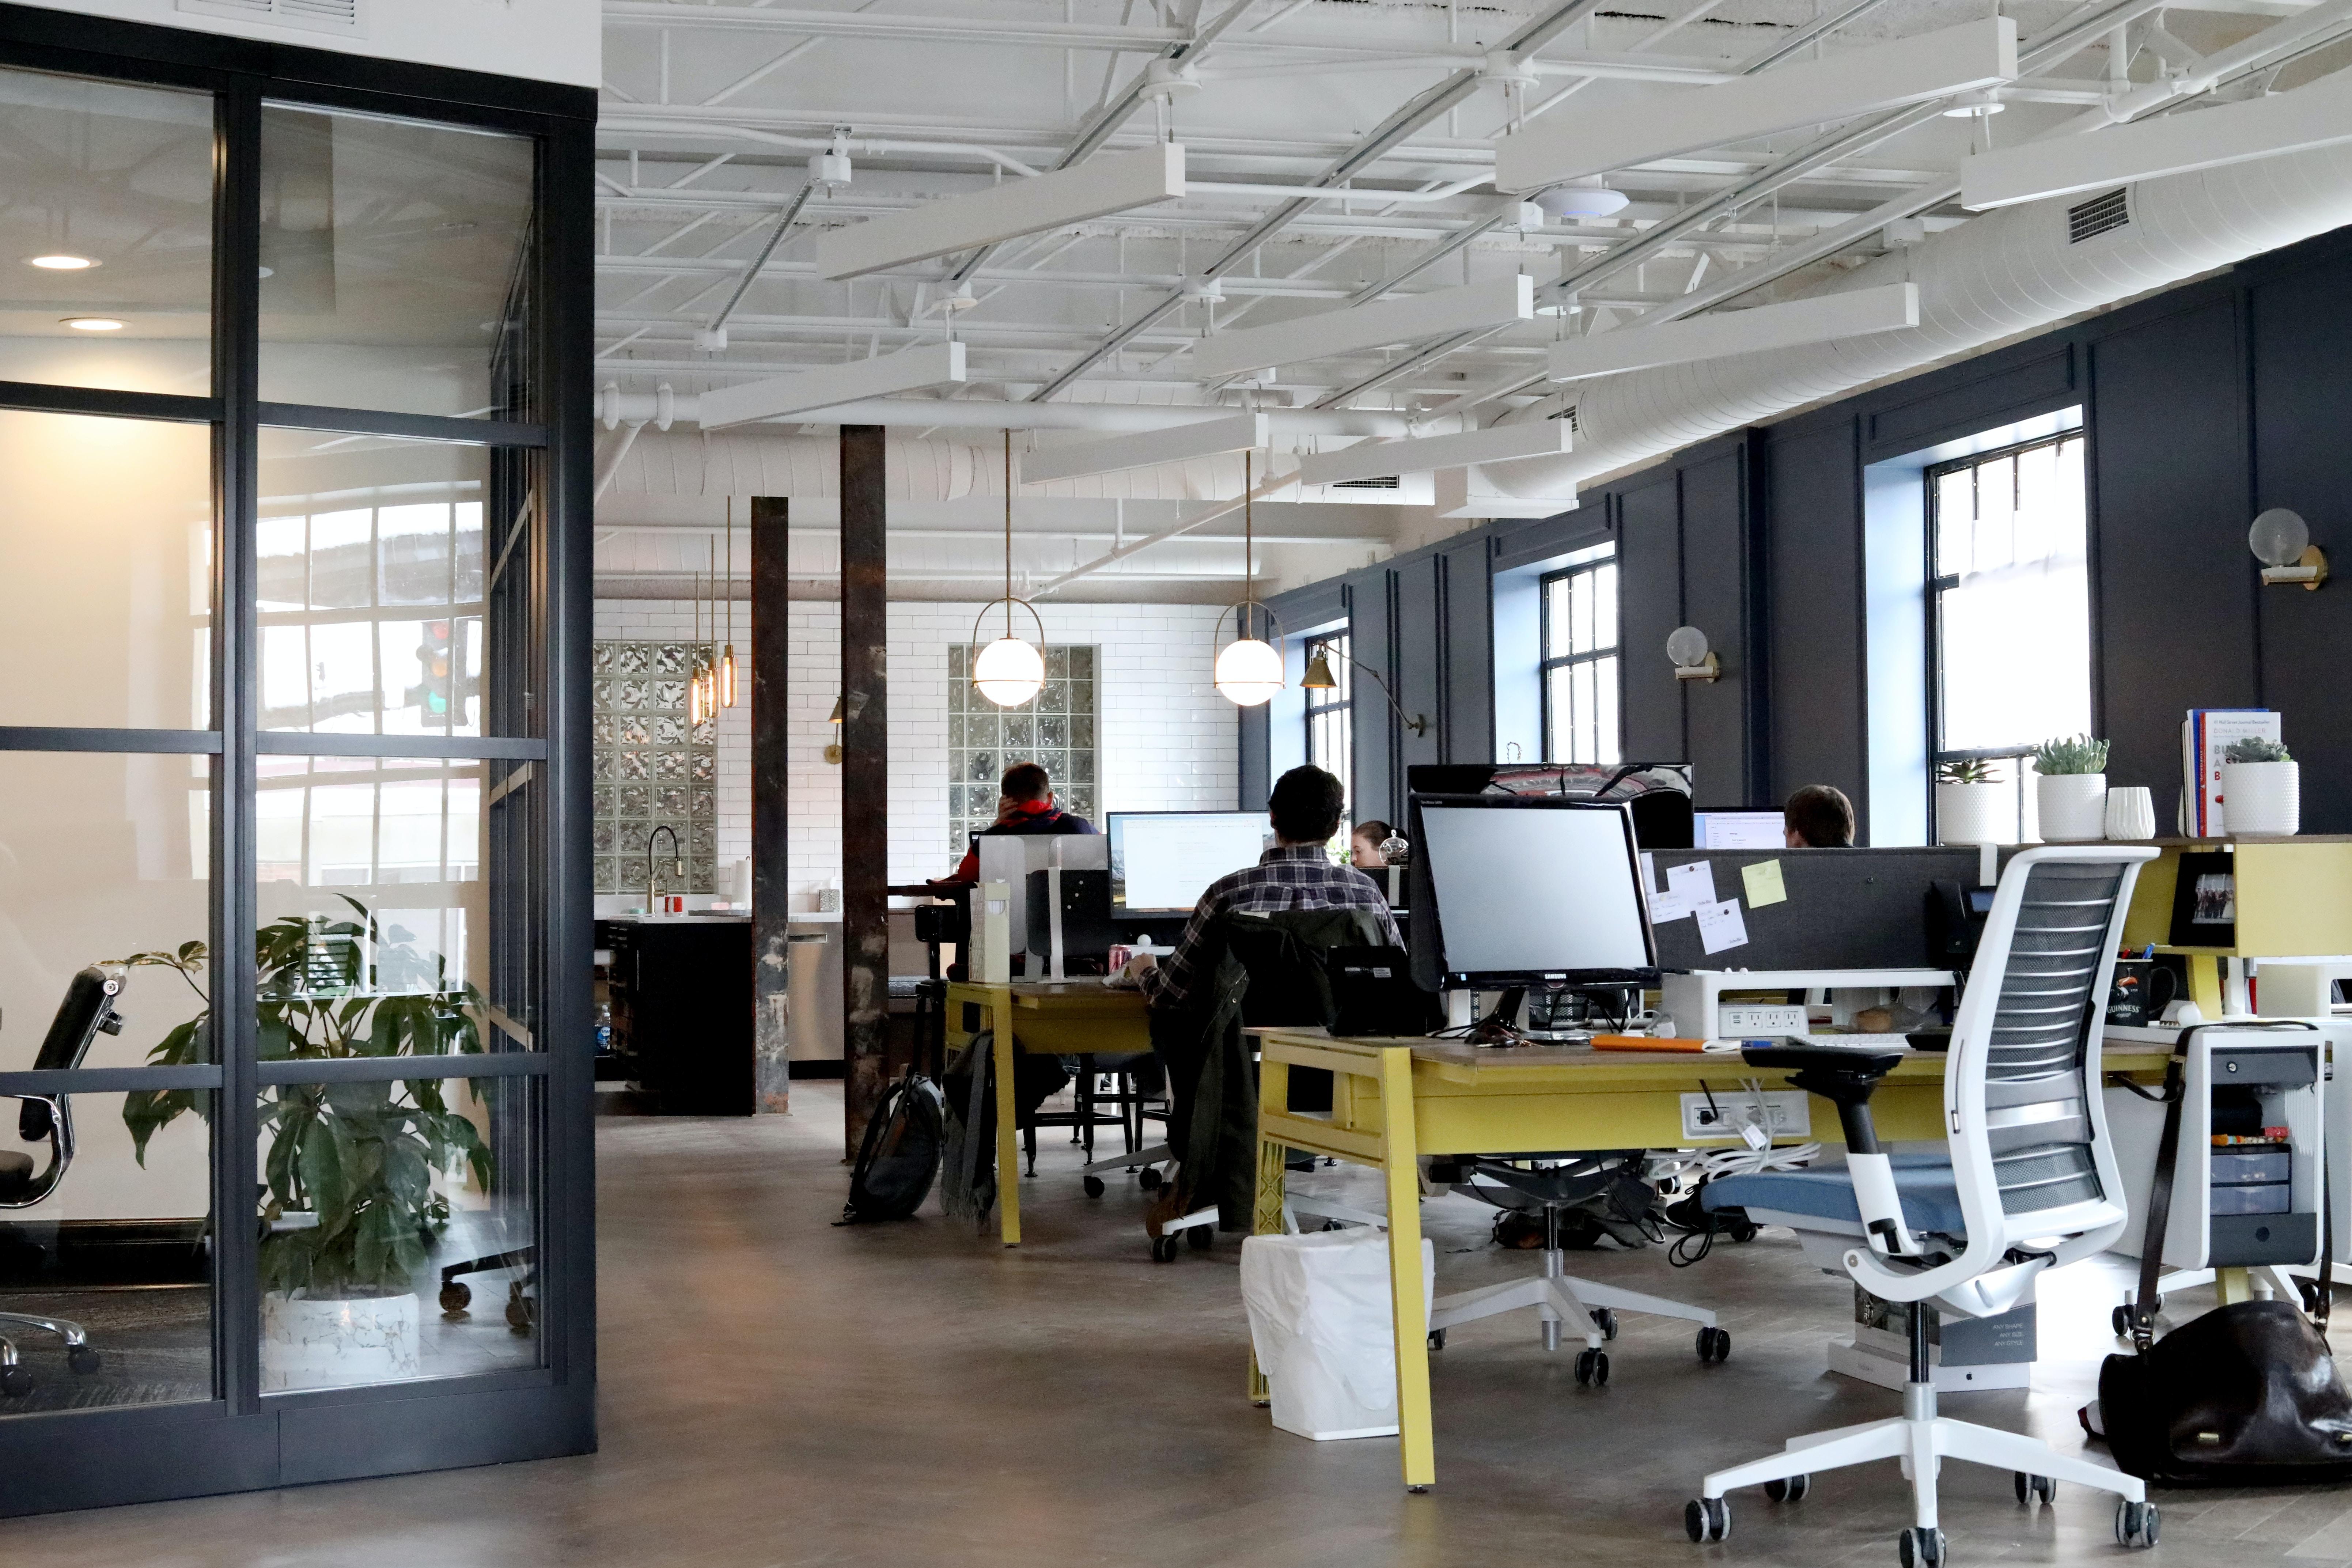 Web Design: An In-Demand Career Option